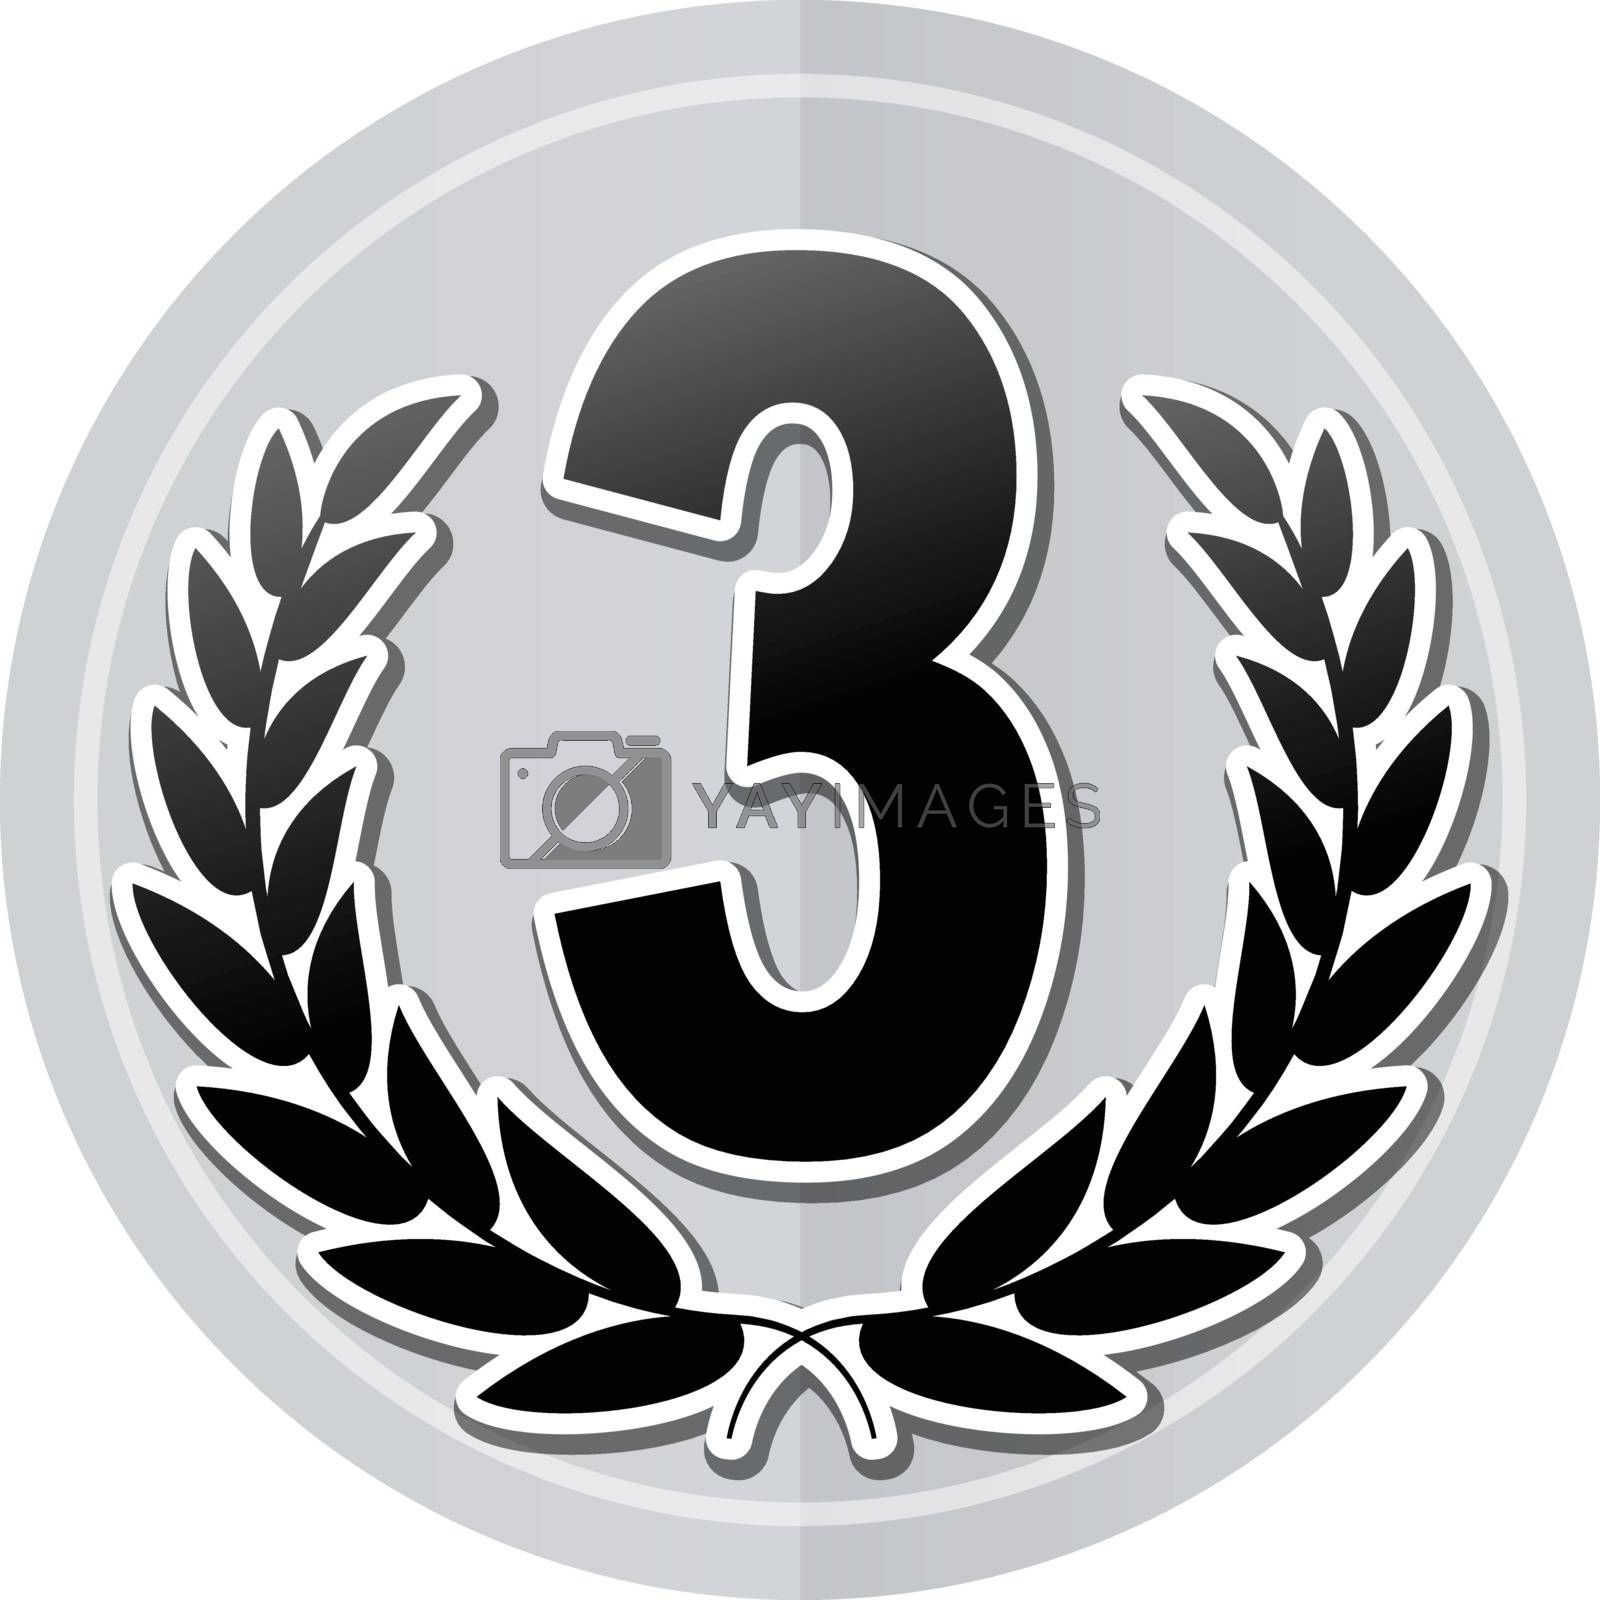 Illustration of third sticker icon simple design